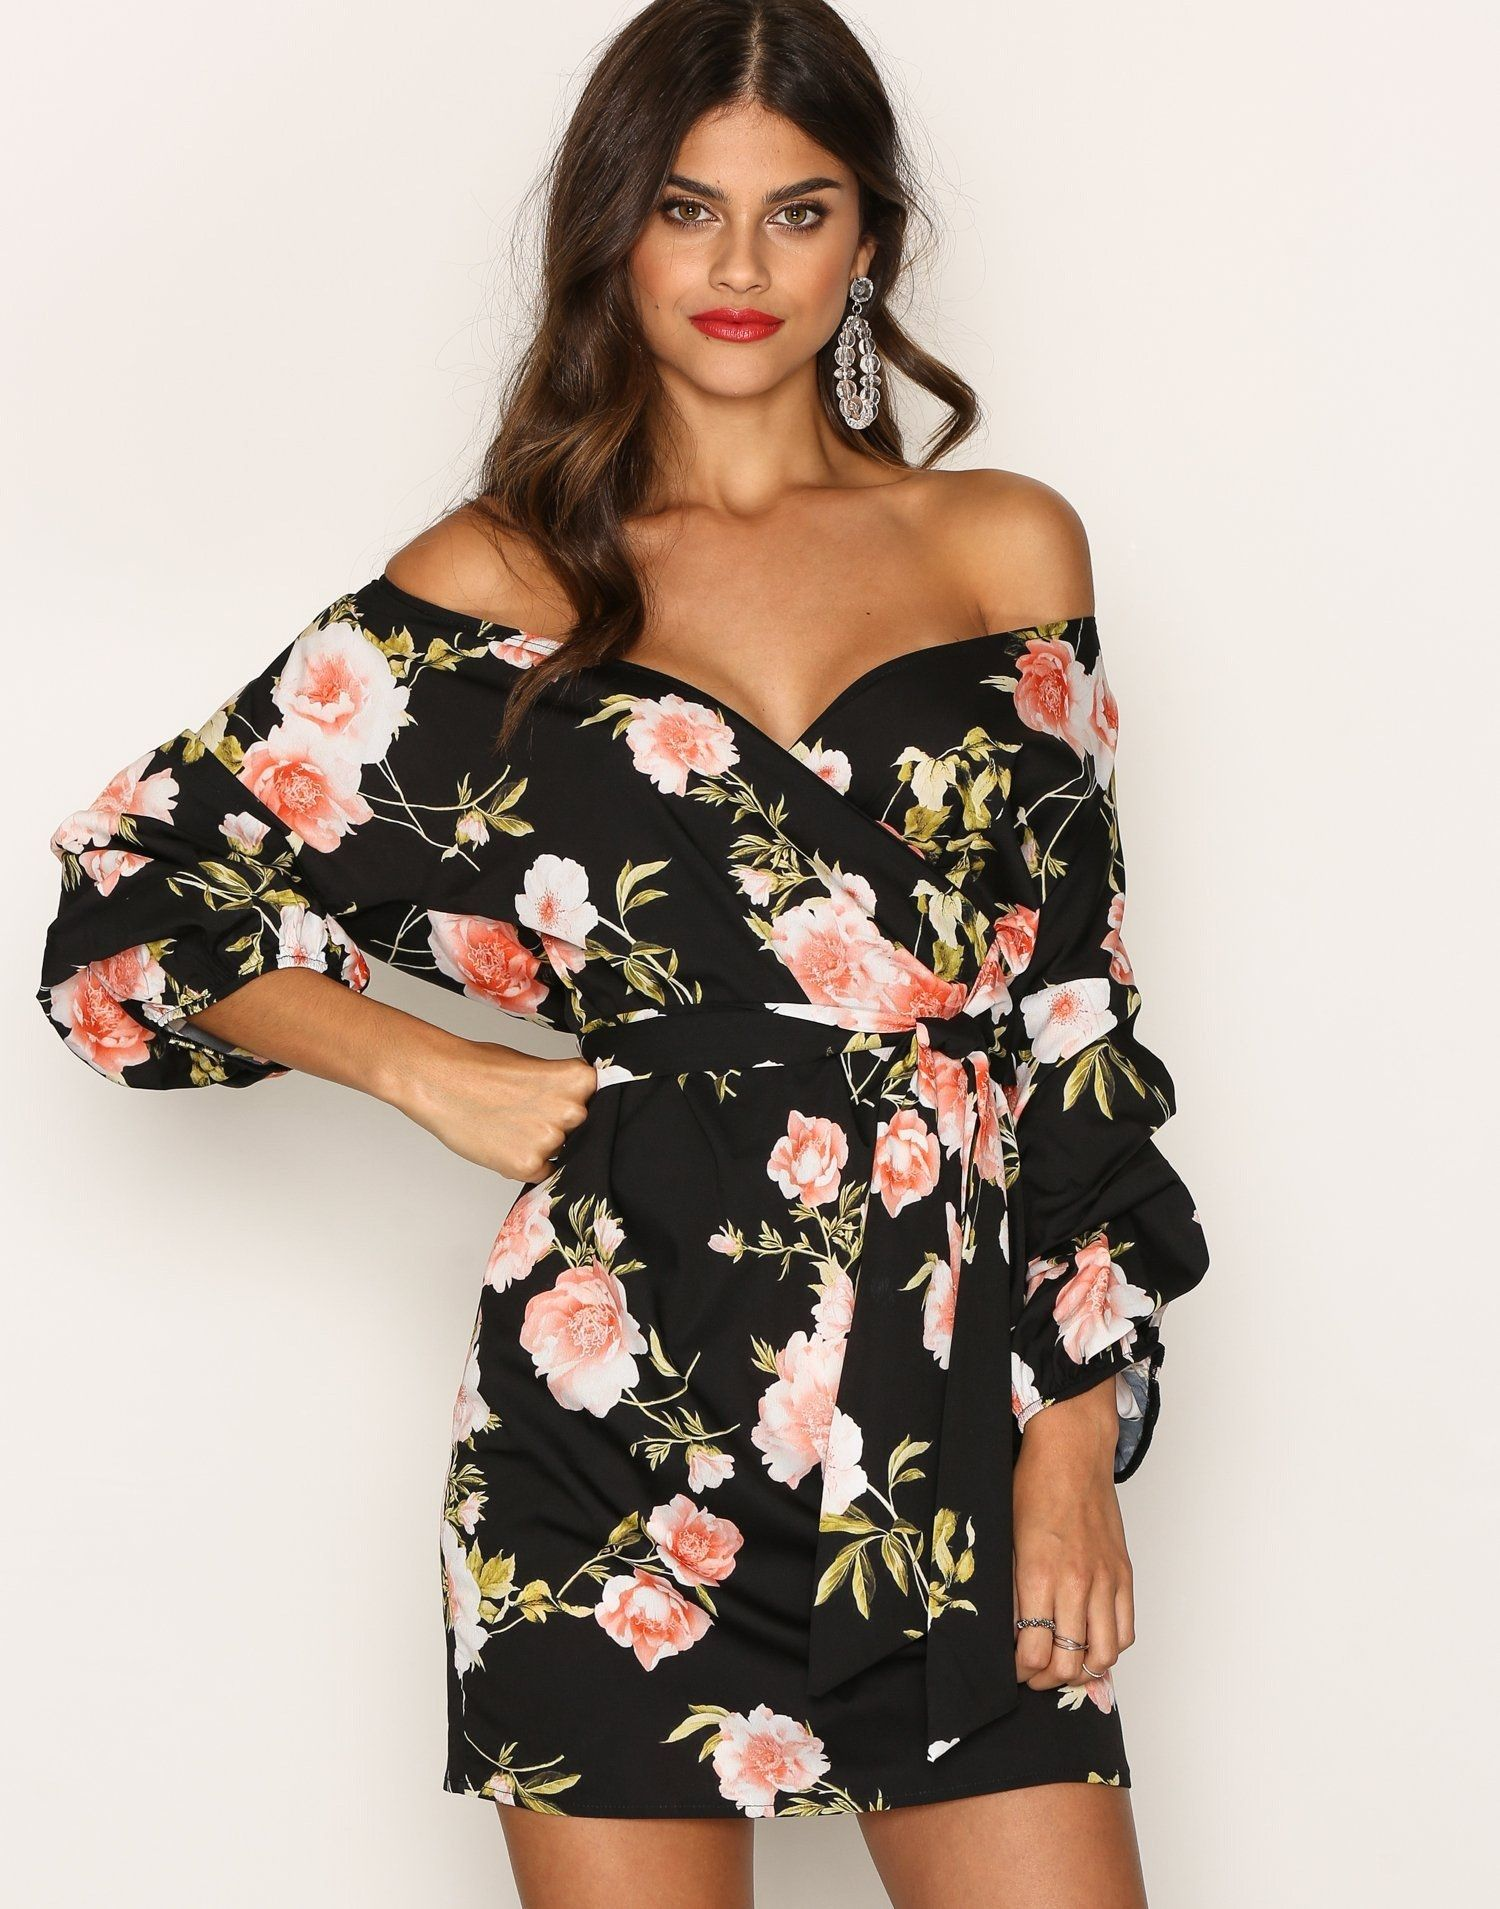 d2e15ed8729e Wrap Shoulder Dress - Nly Trend - Floral - Dresses - Clothing ...